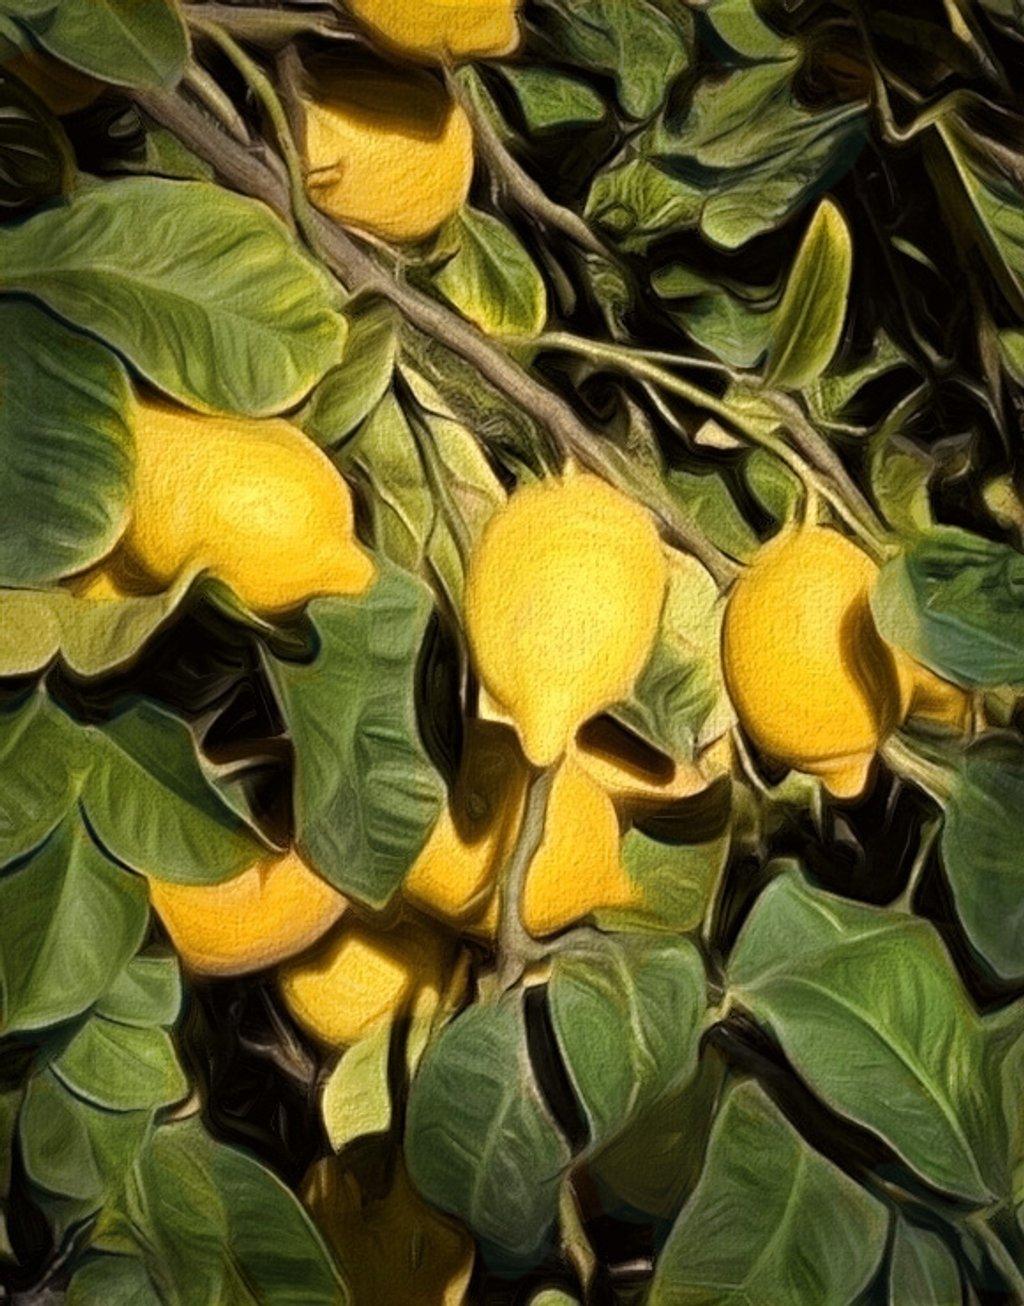 Lemon Tree by joysfocus